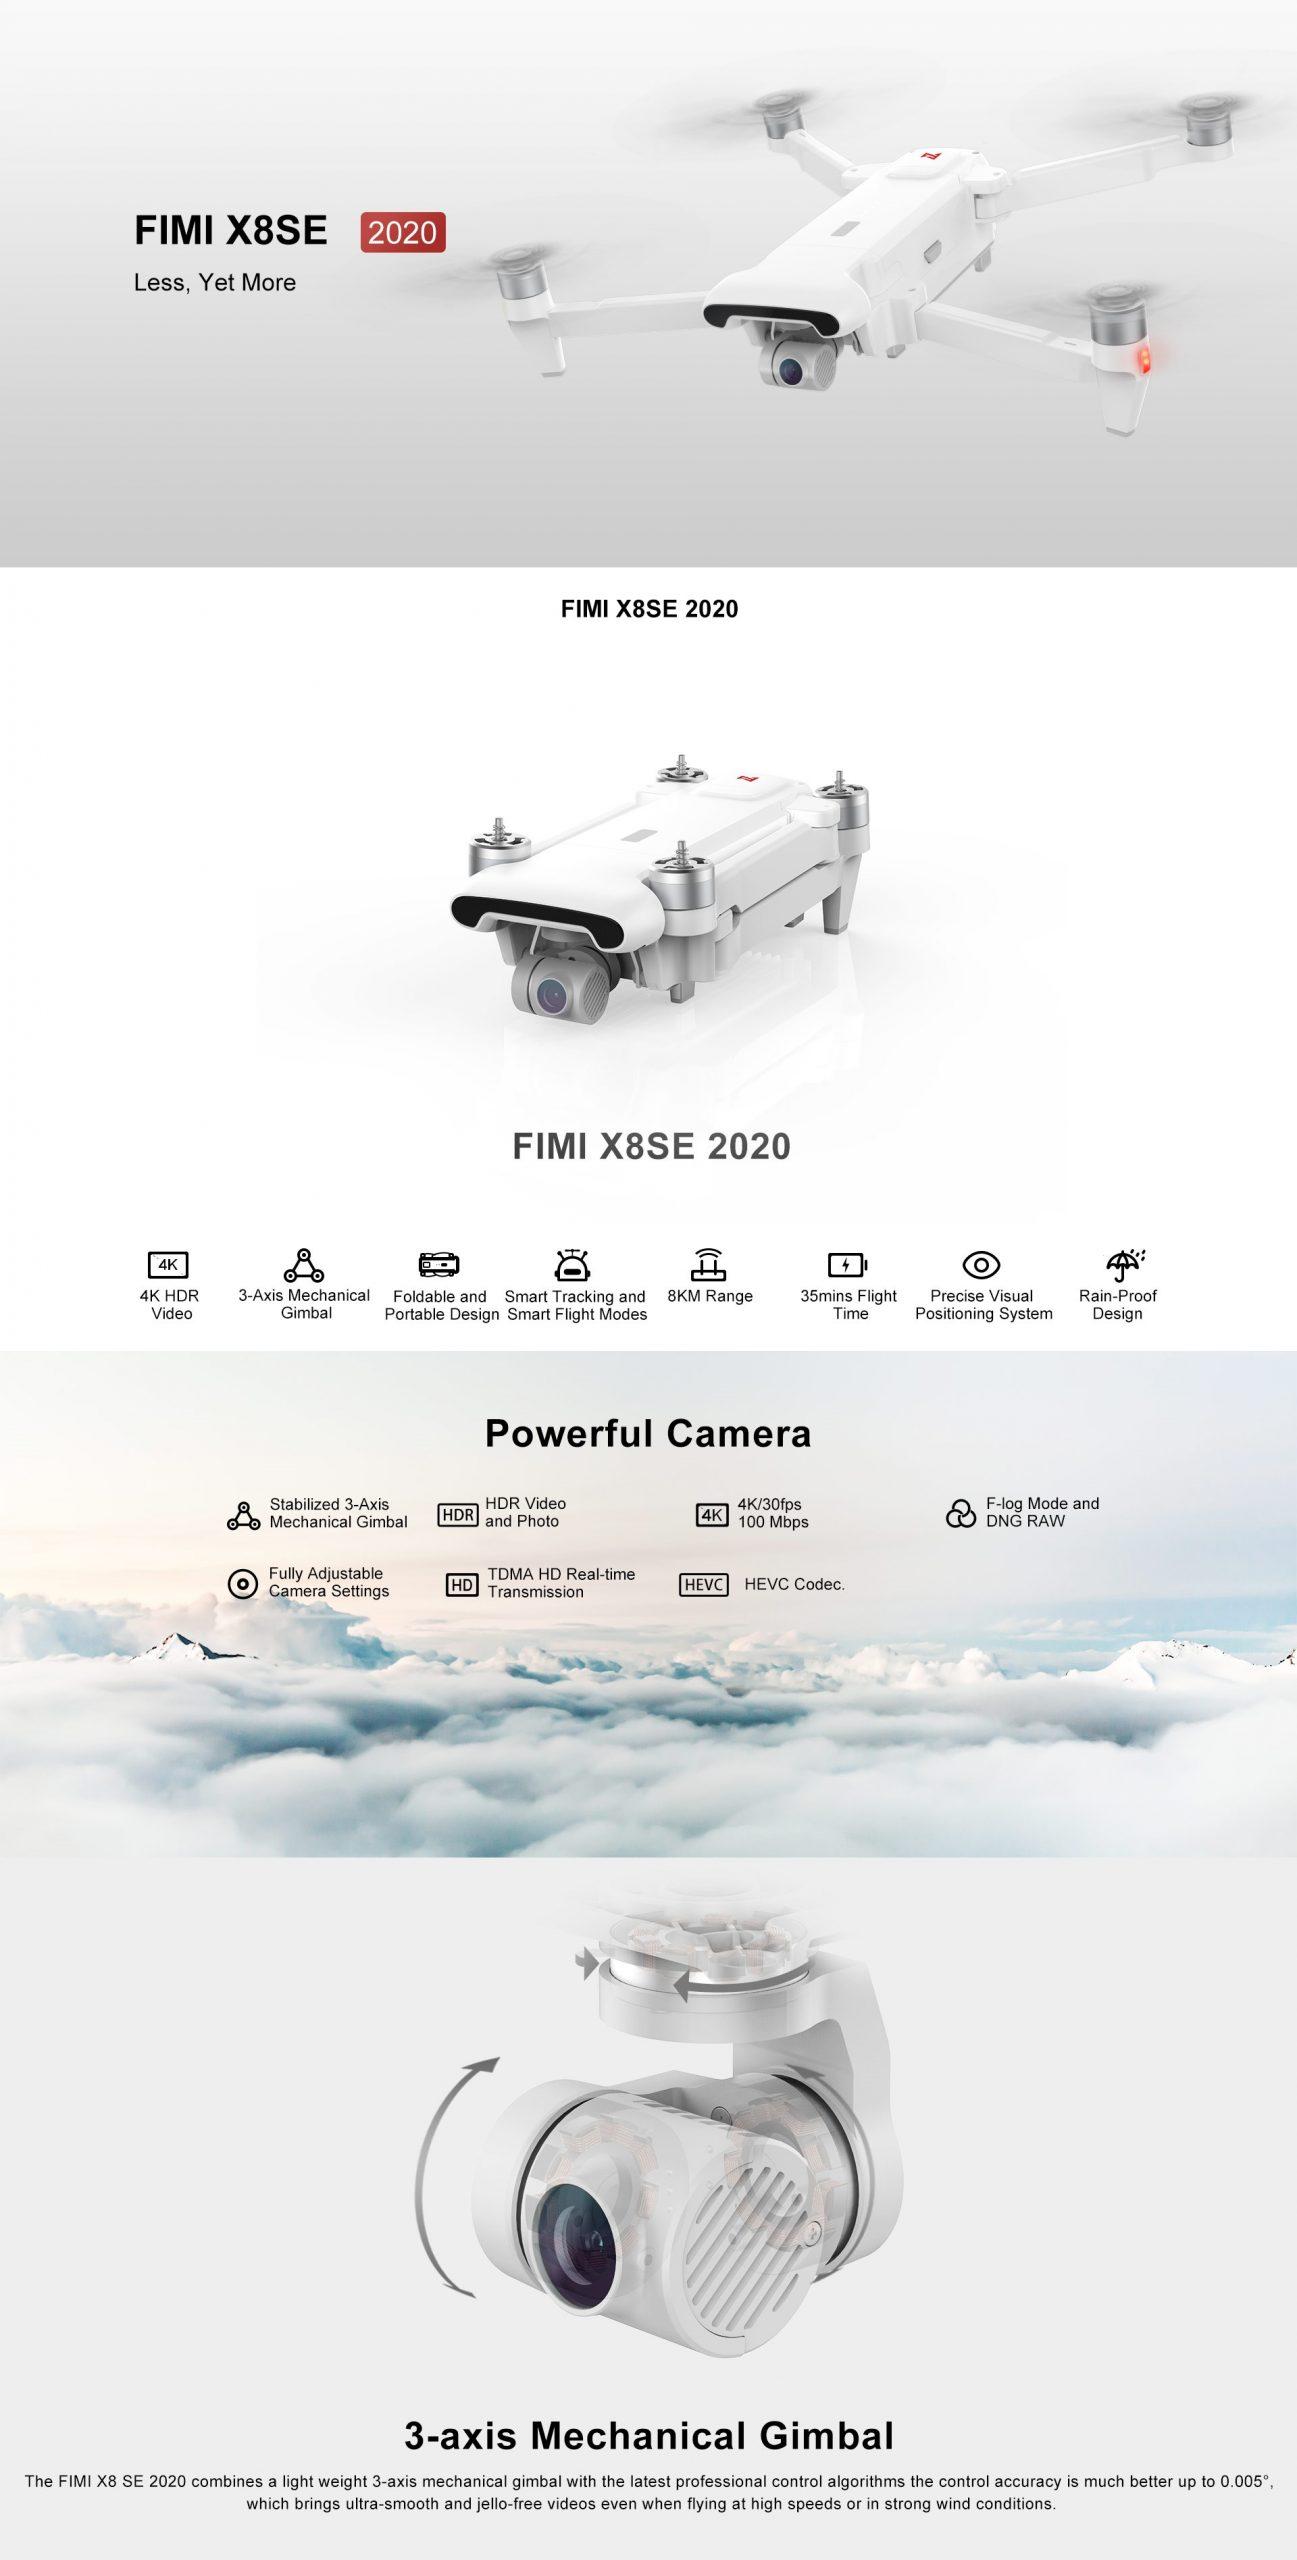 rc-quadcopters Xiaomi FIMI X8 SE 2020 8KM FPV 4K Camera HDR Video GPS RC Quadcopter xiaomi fimi x8se scaled